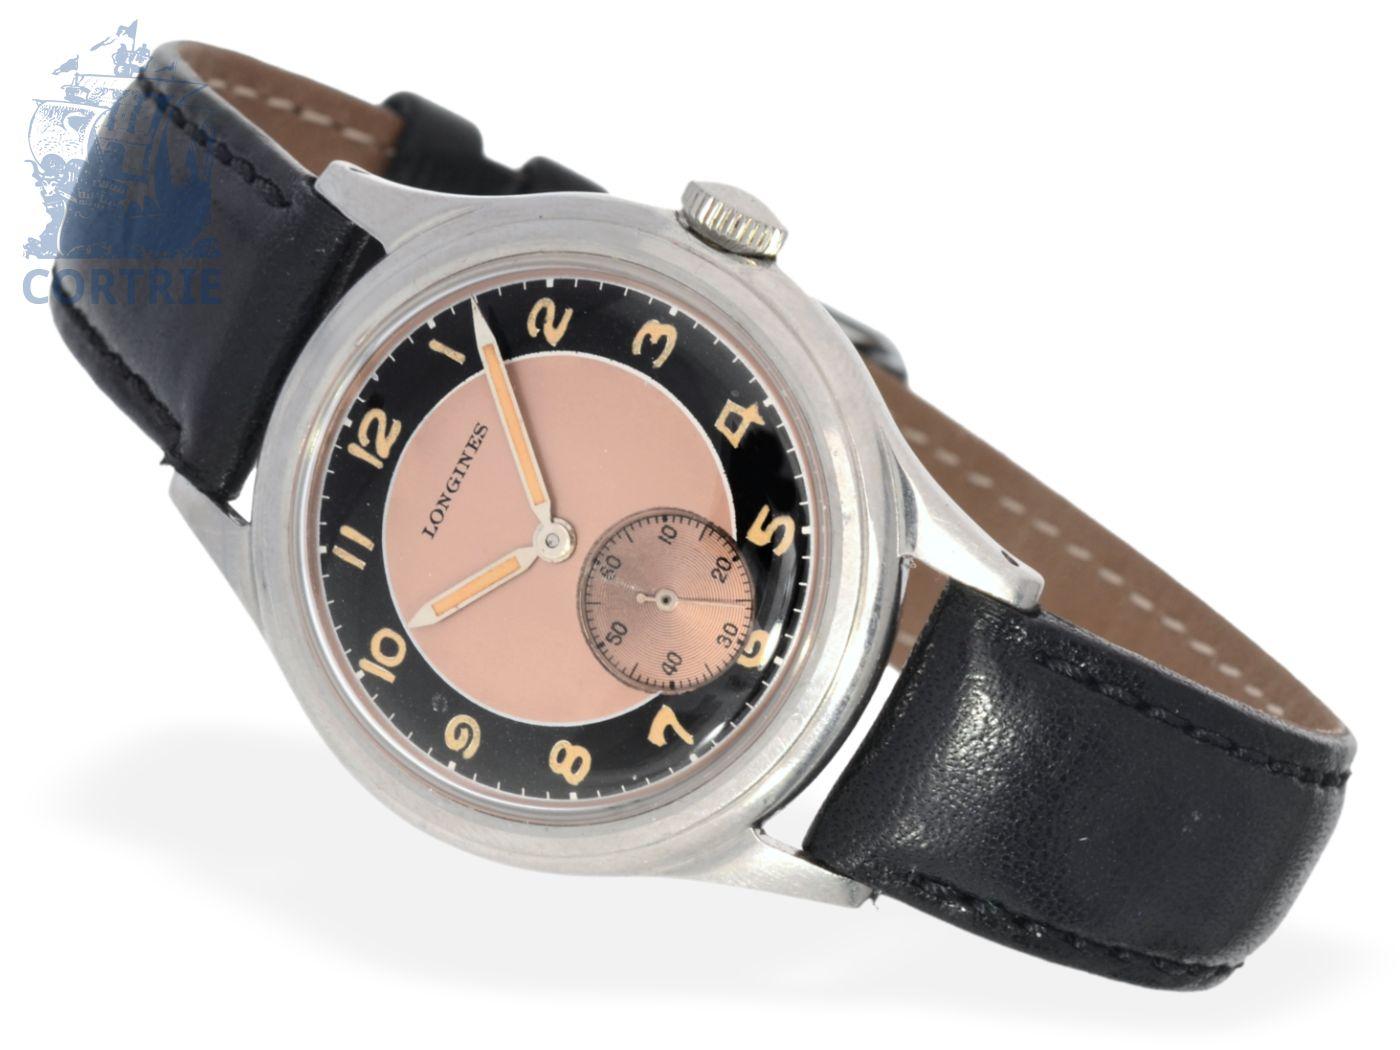 Wristwatch: fine and rare Longines gentlemen's watch, stainless steel, ca. 1940-